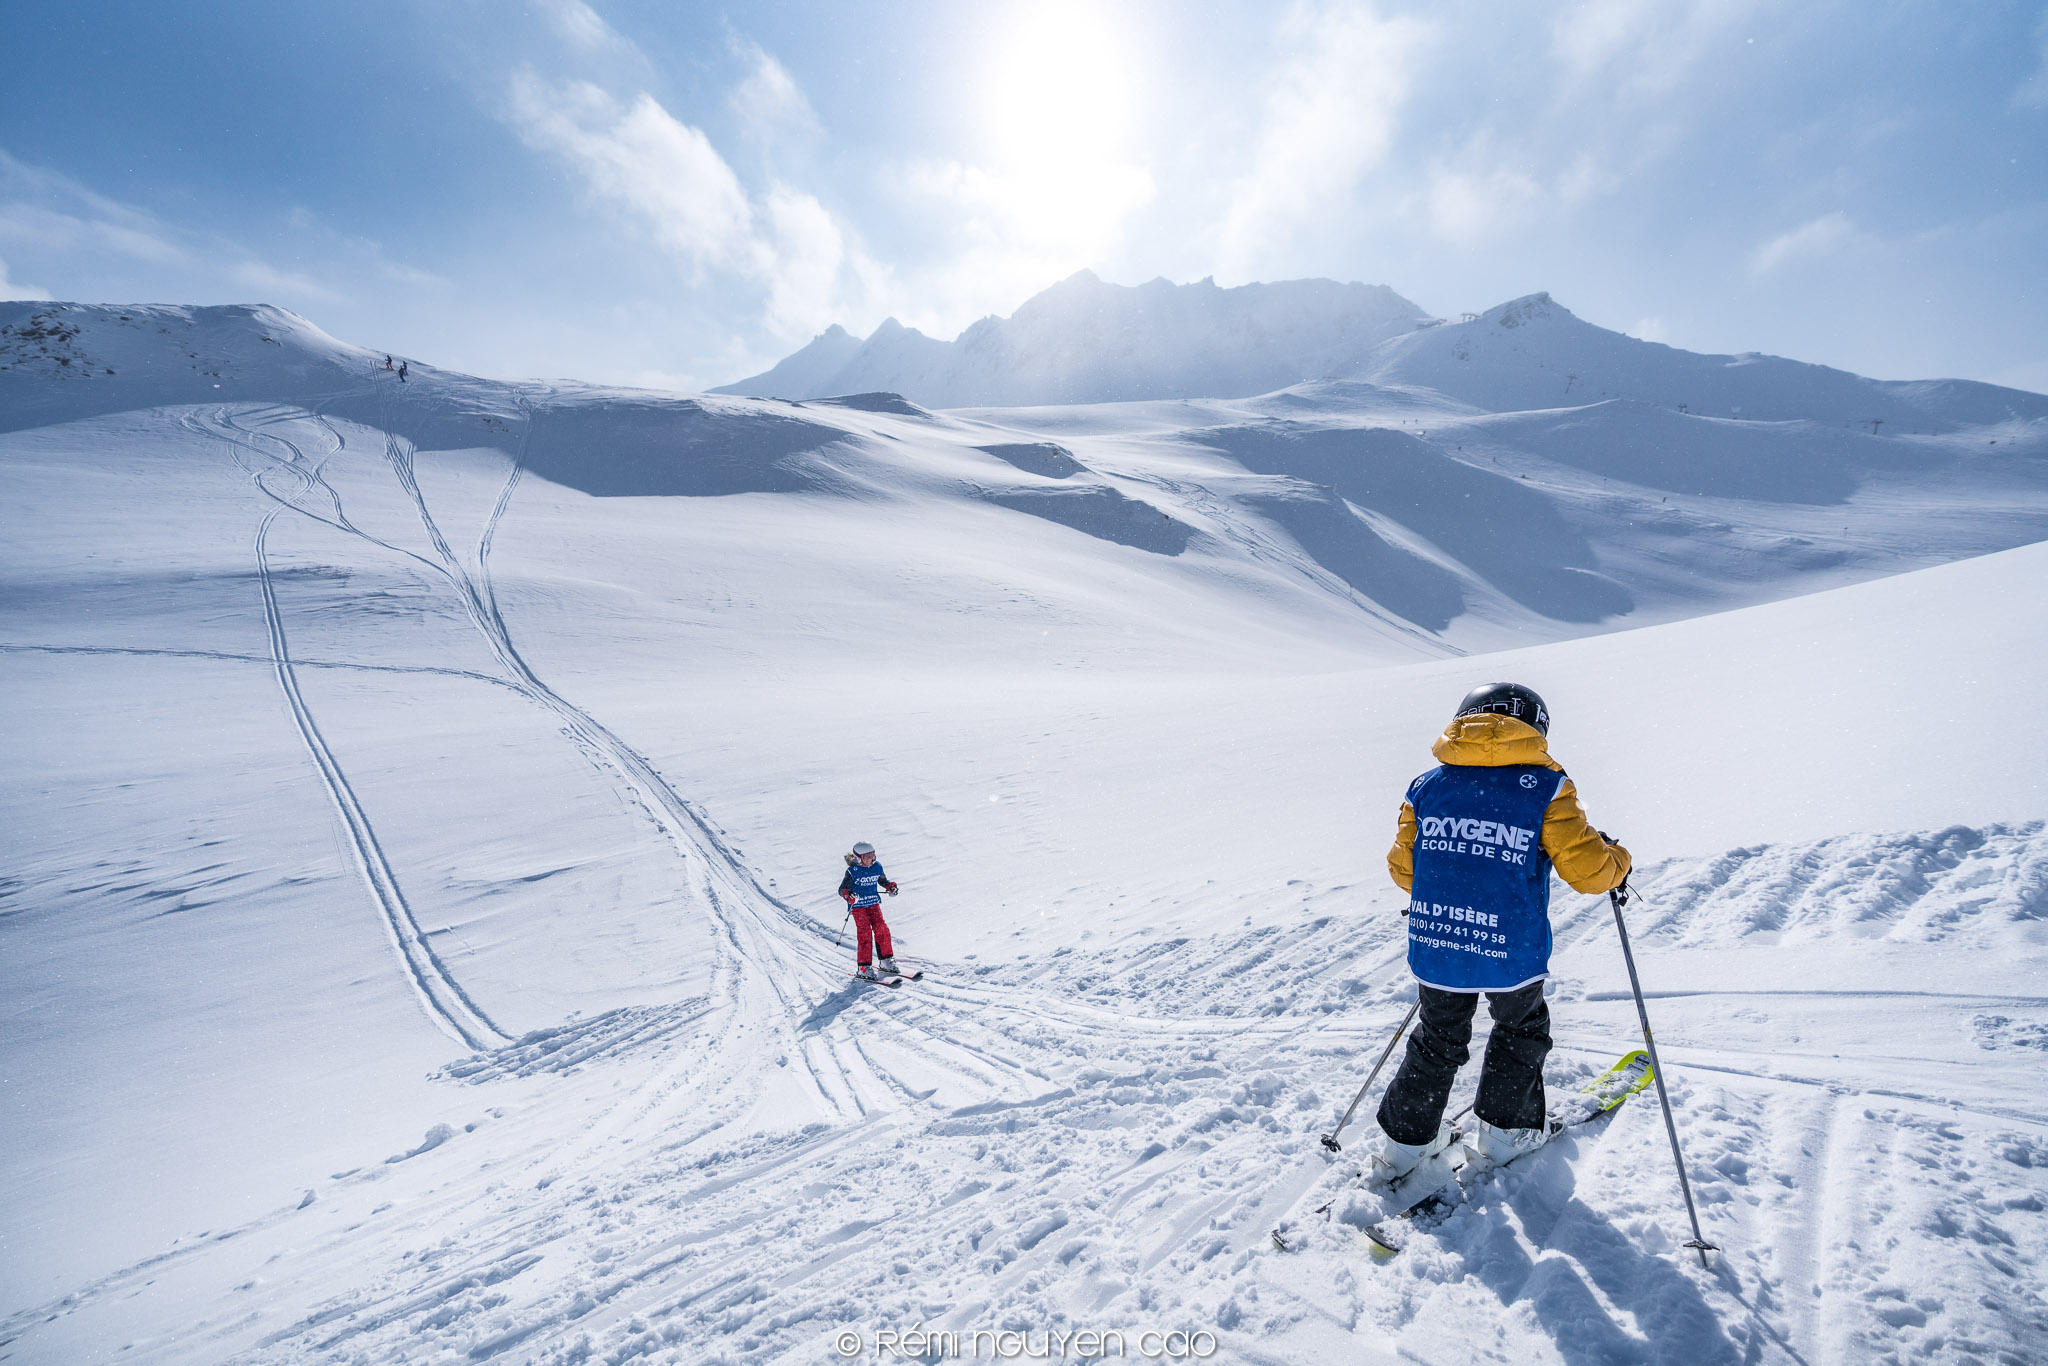 Pro Rider ski lesson